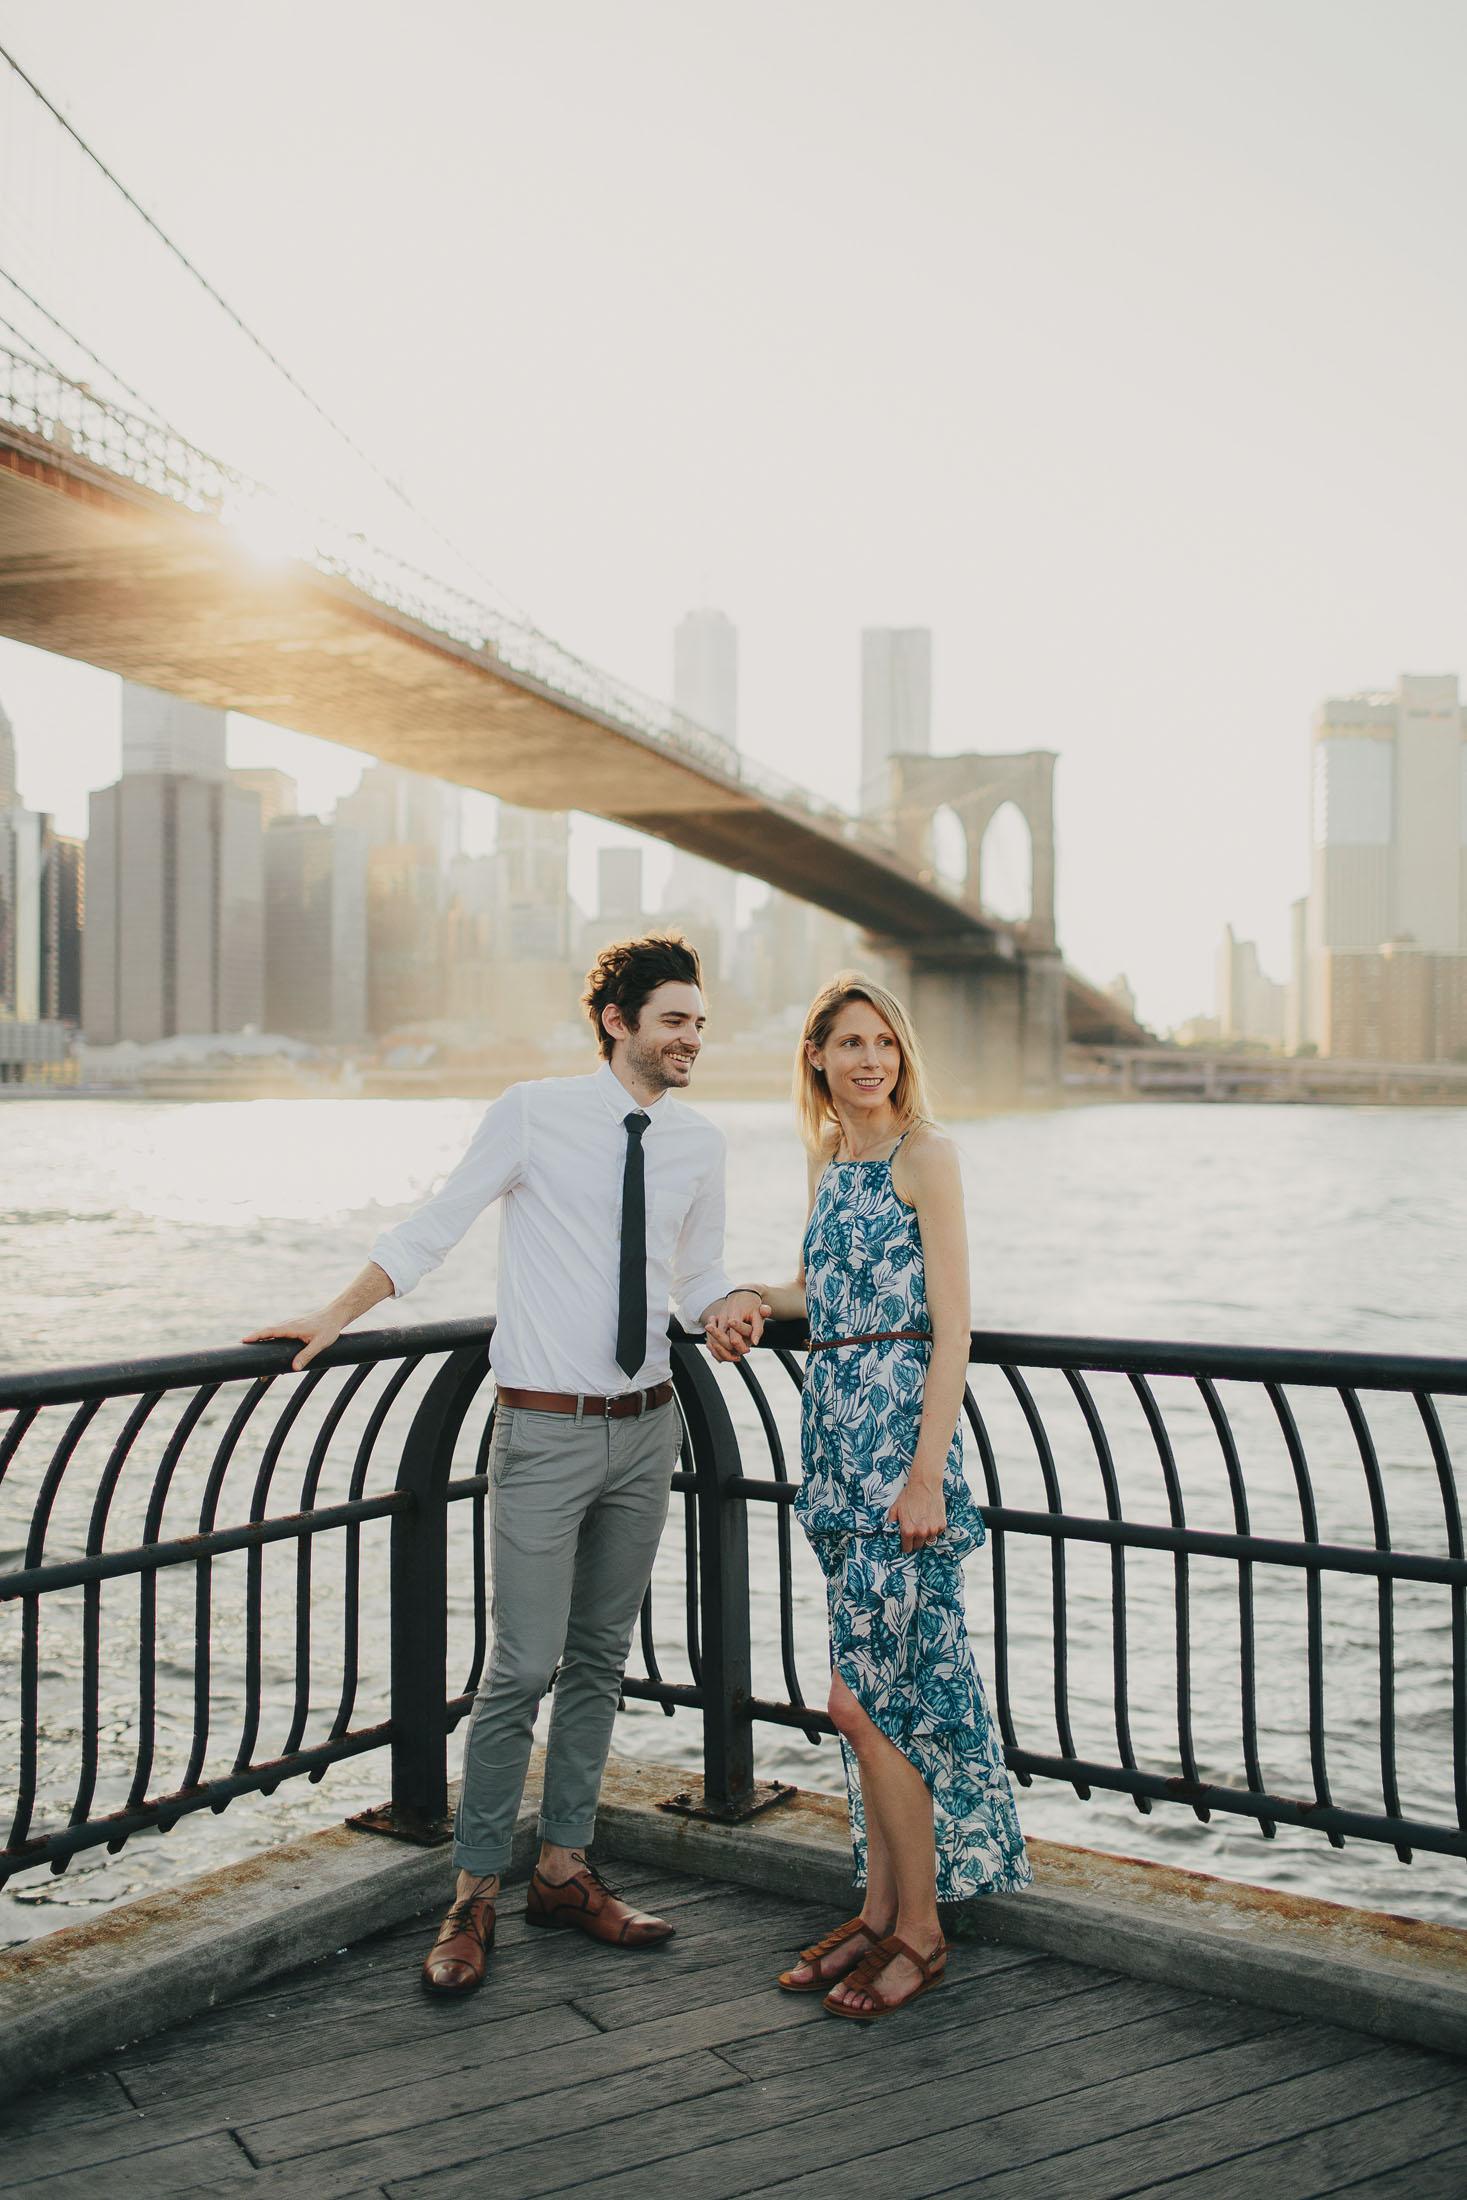 39 finch and oak engagement wedding photographer gold coast new york brooklyn.jpg